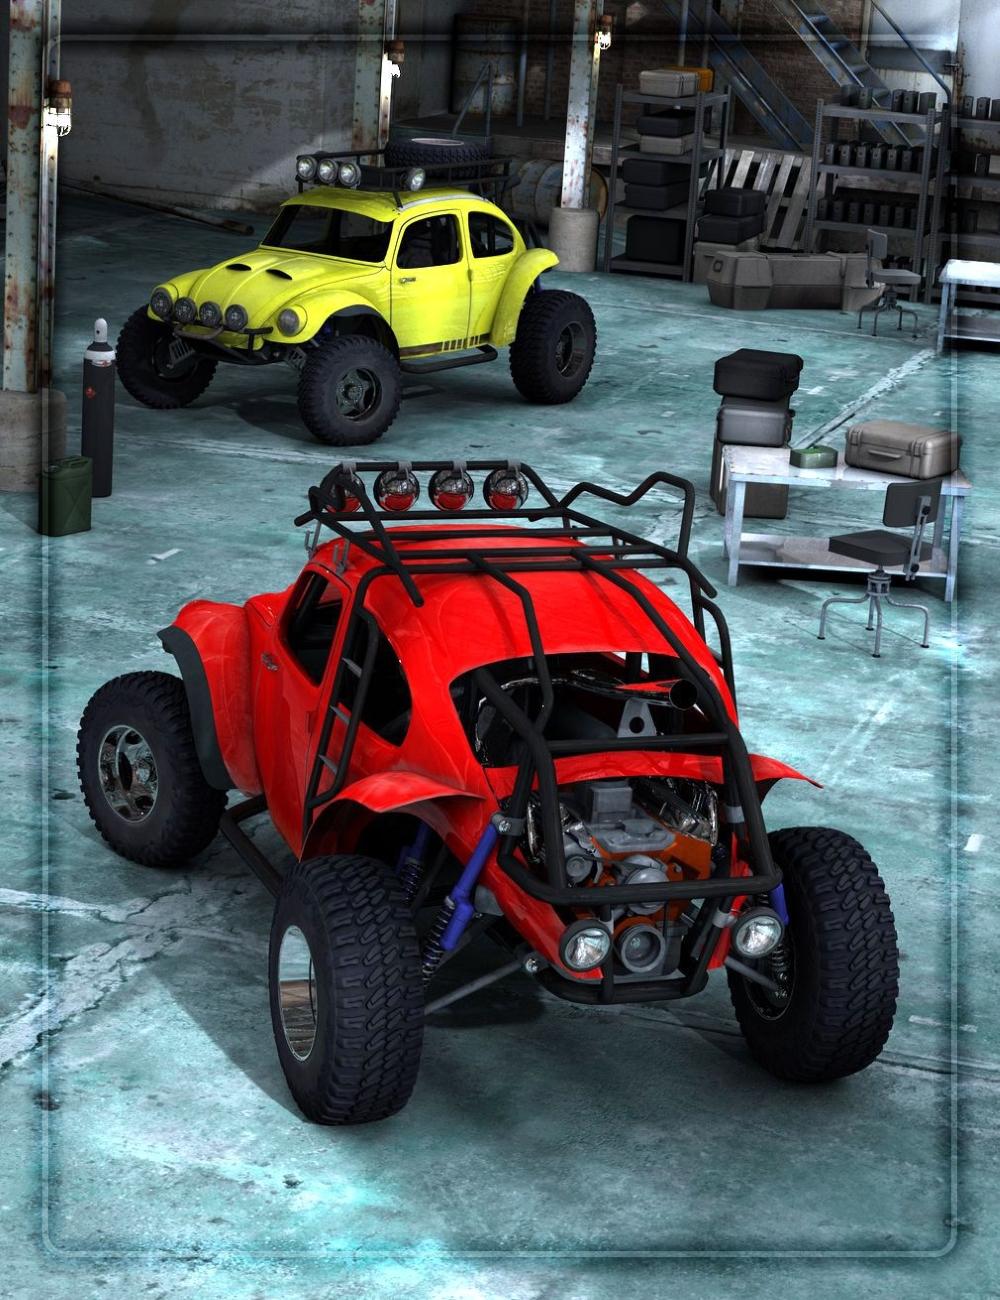 Baja Bug by: DzFire, 3D Models by Daz 3D